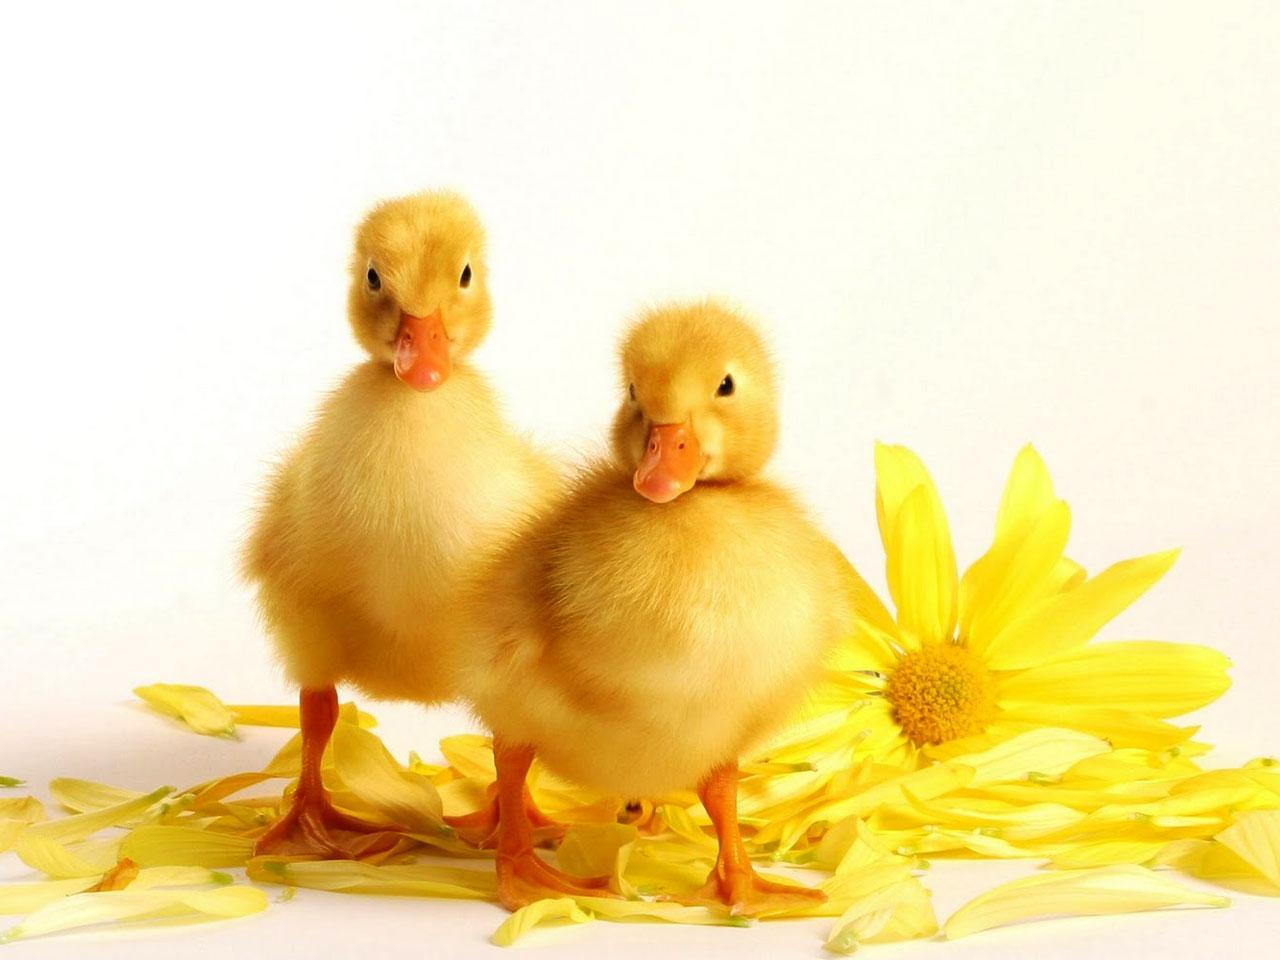 duck wallpaper free